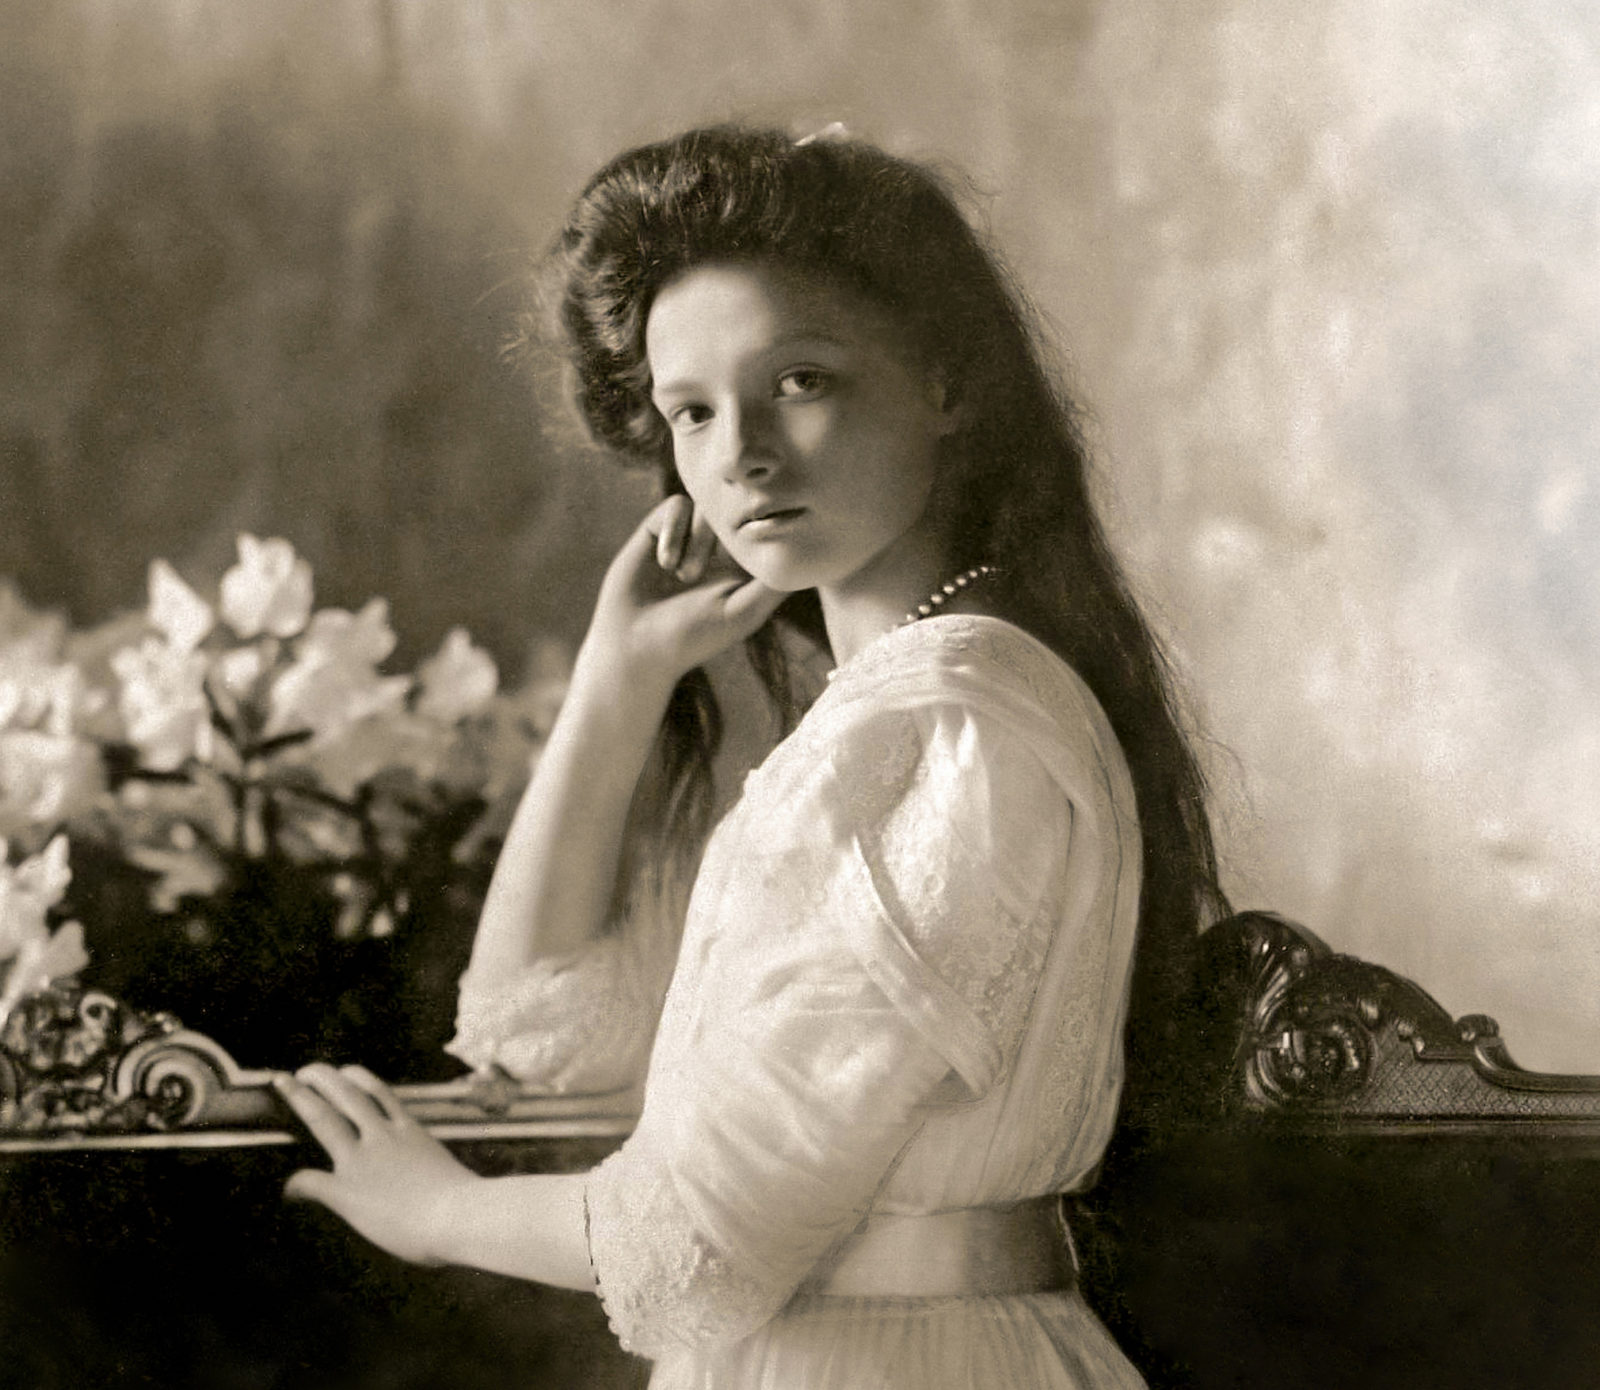 The Grand Duchess Tatiana Nikolaevna.  The second daughter of the Russian Emperor Nicholas II.